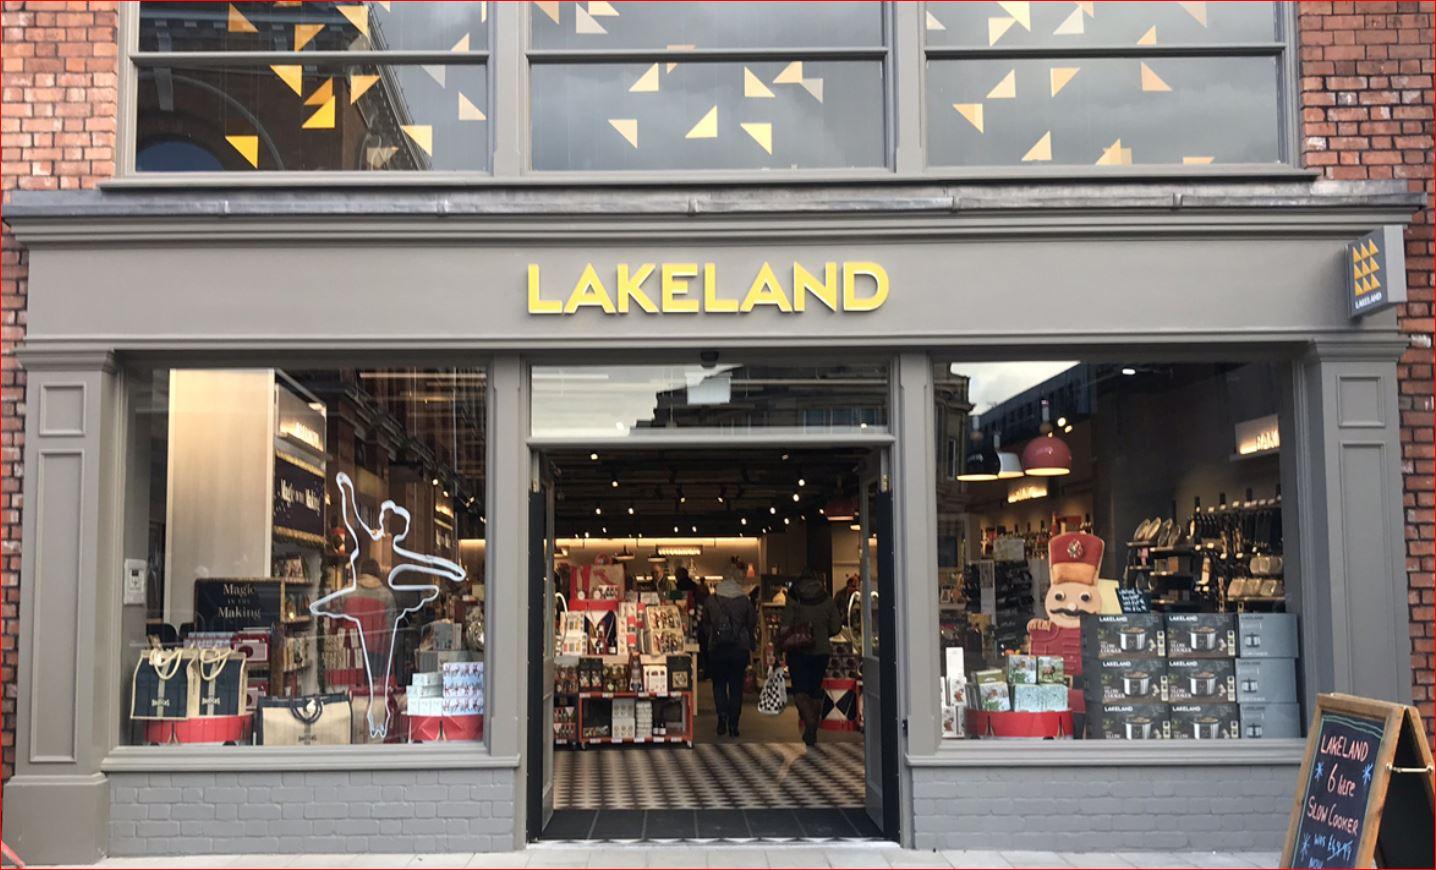 Lakeland Customer Opinion Survey